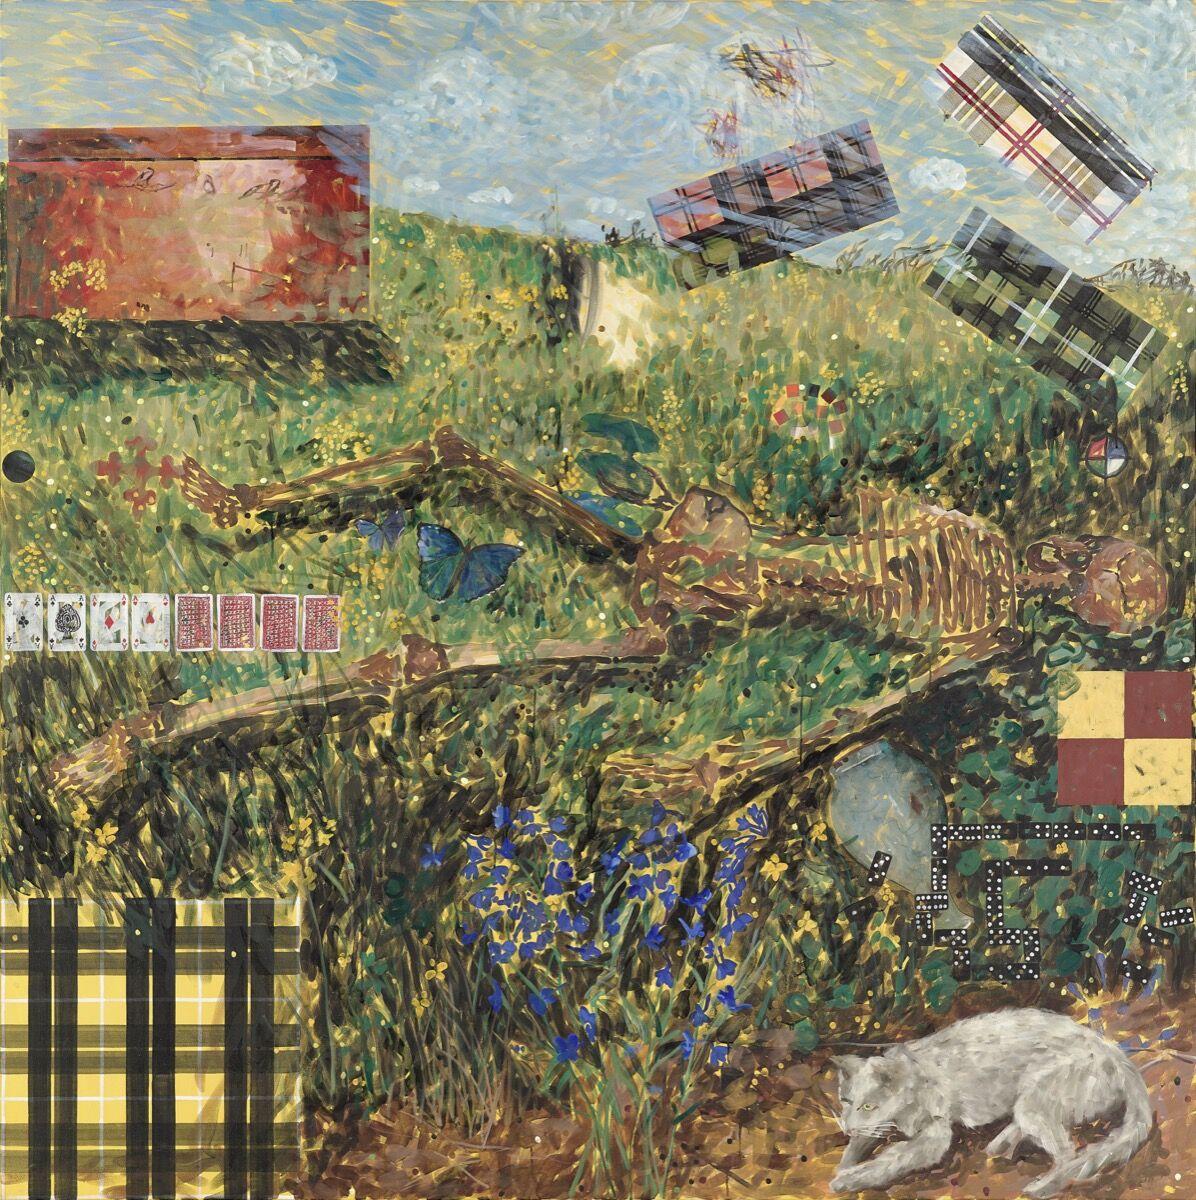 Jennifer Bartlett, Summer, 1990. Courtesy of the artist and Locks Gallery.